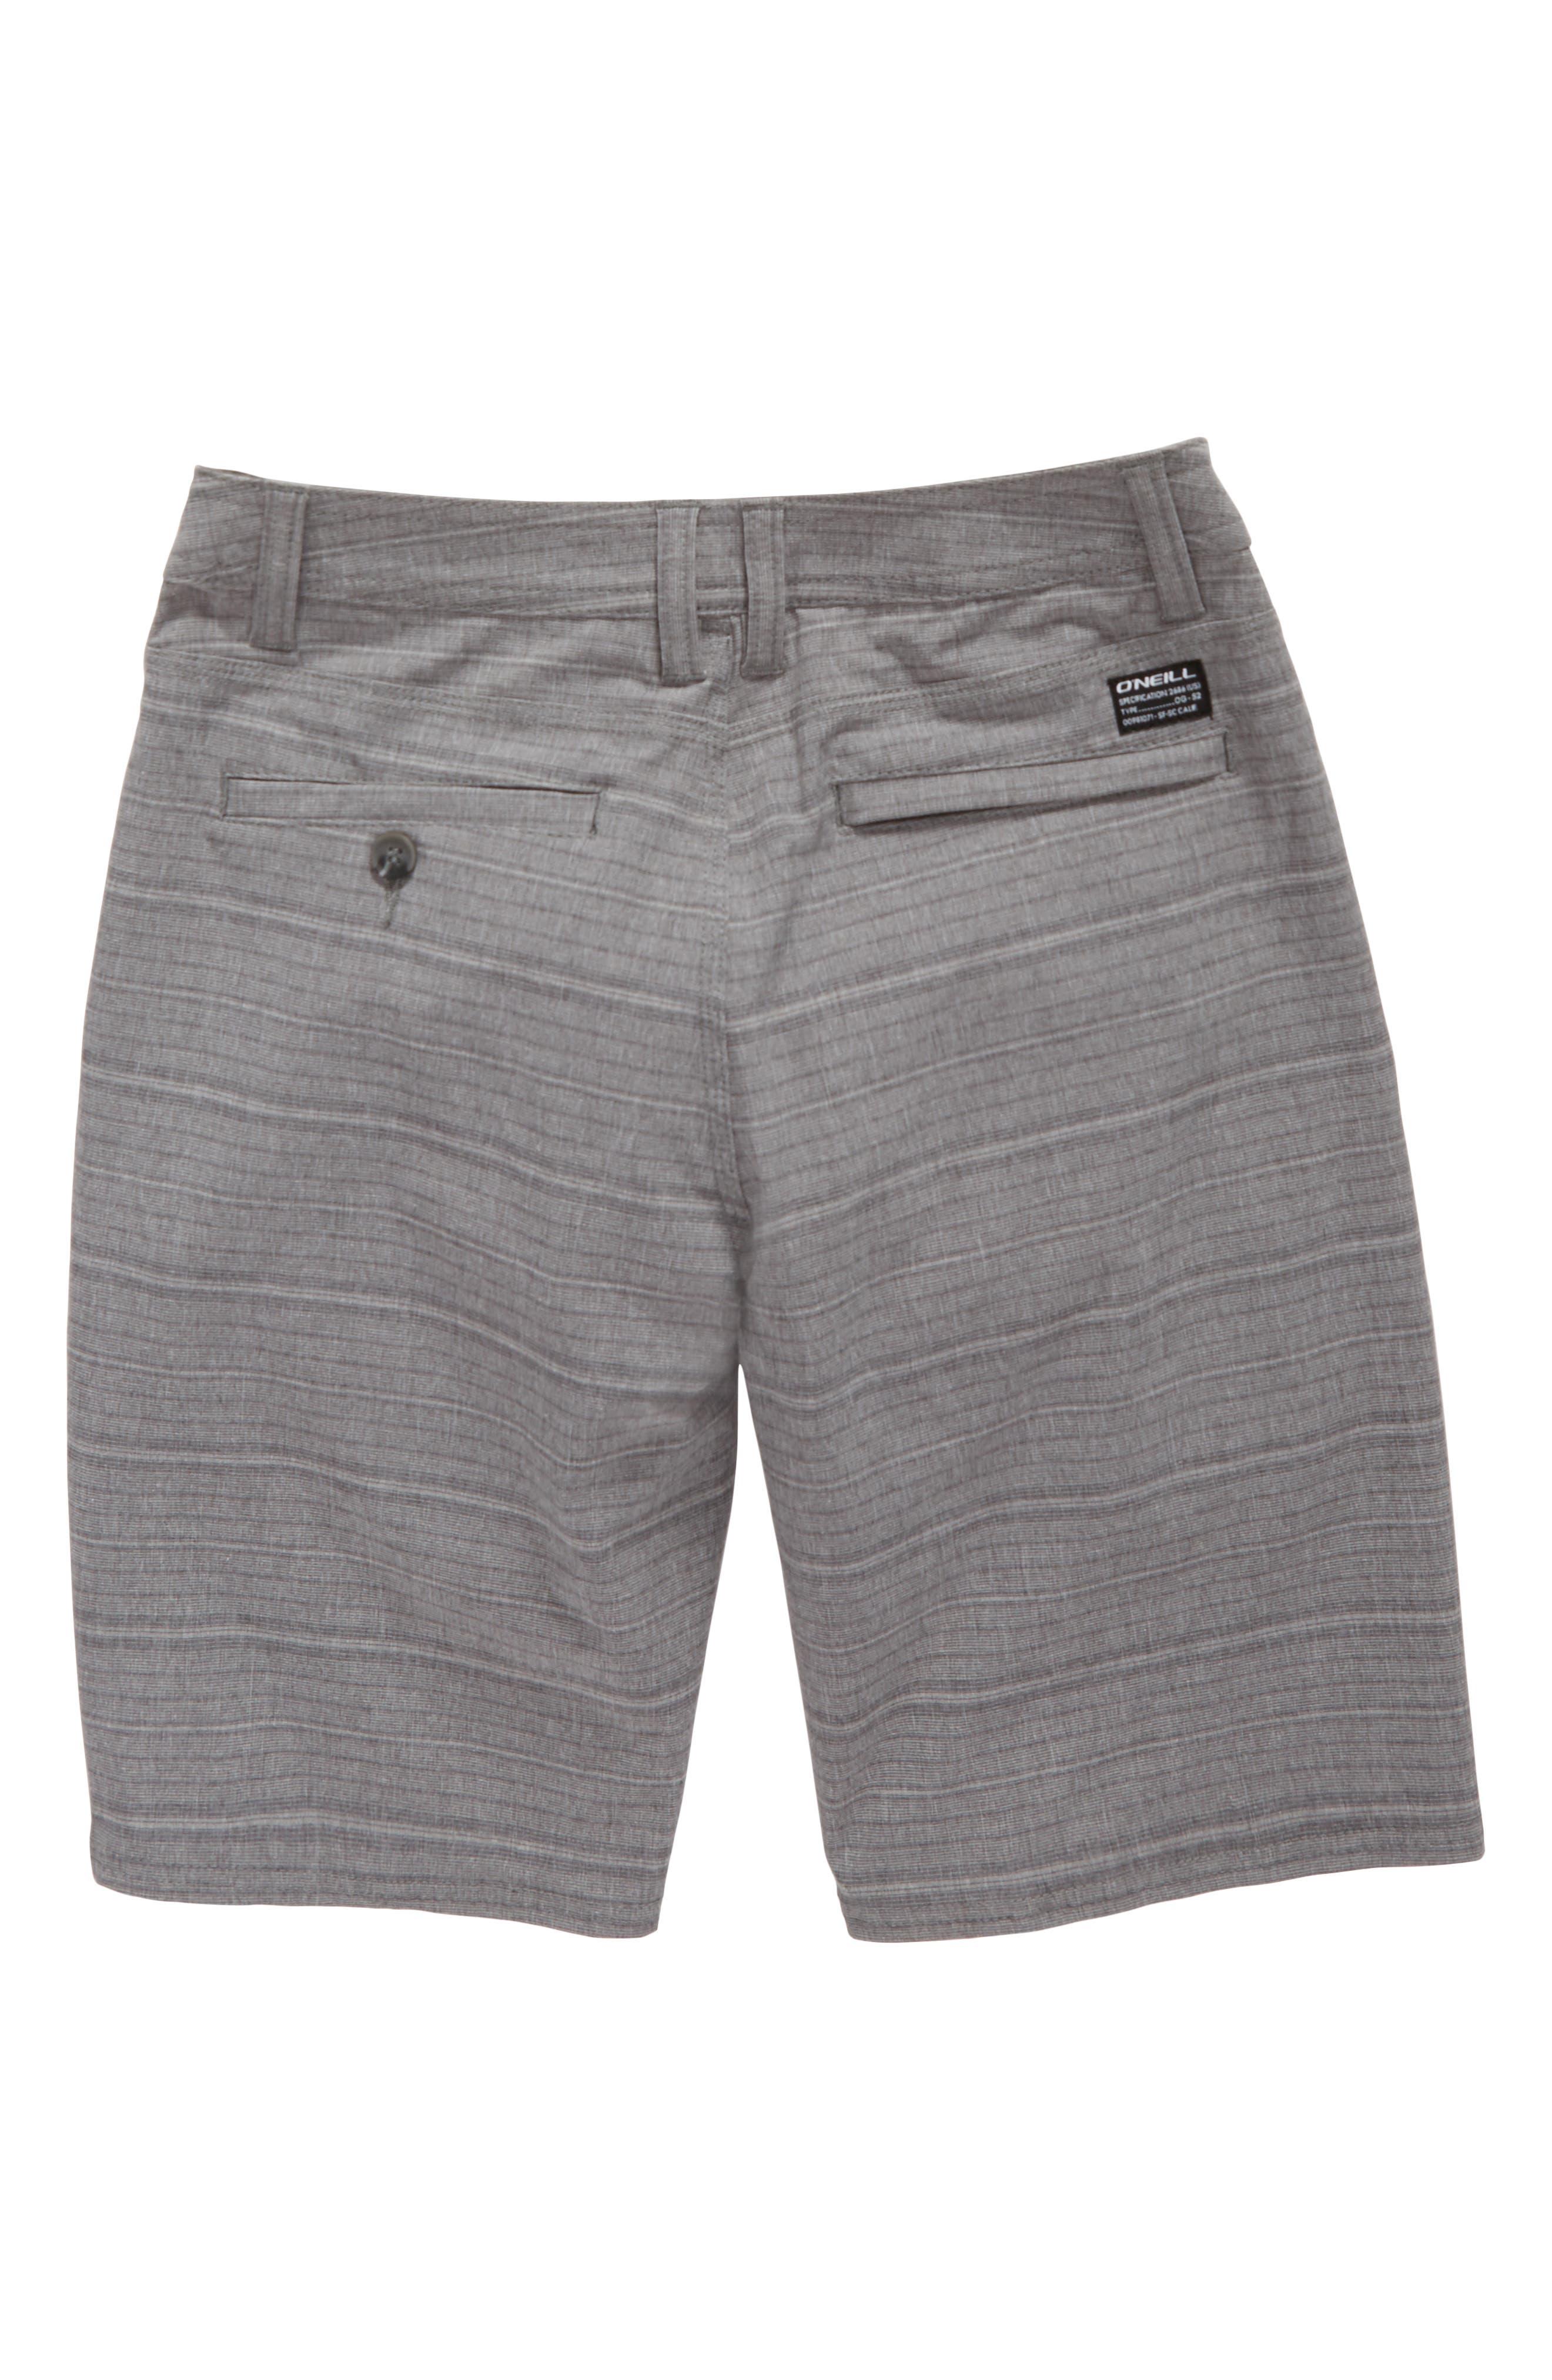 Locked Stripe Hybrid Shorts,                             Alternate thumbnail 4, color,                             020